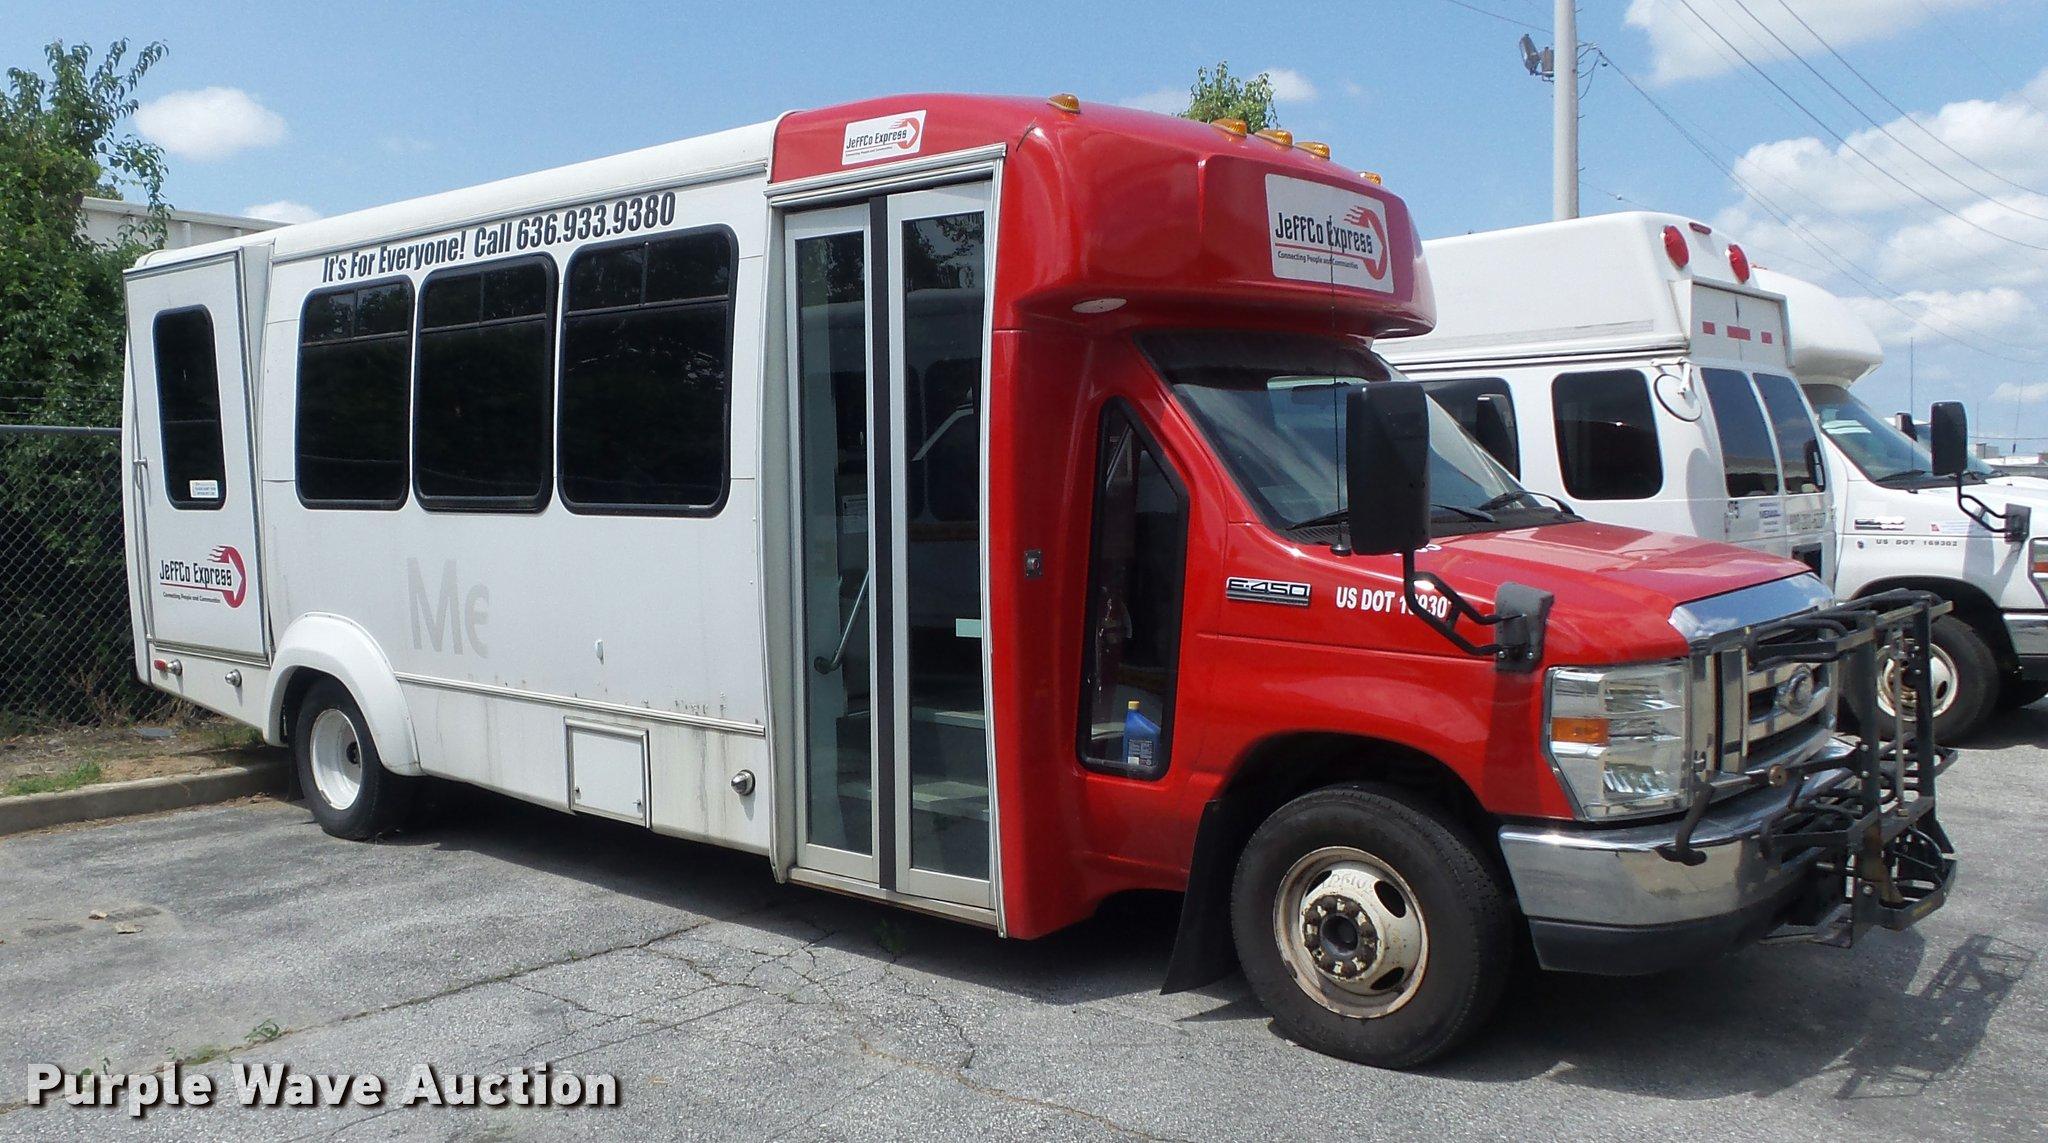 2010 Ford Econoline E450 Super Duty Shuttle Bus In Bridgeton Mo Item Db6495 Sold Purple Wave